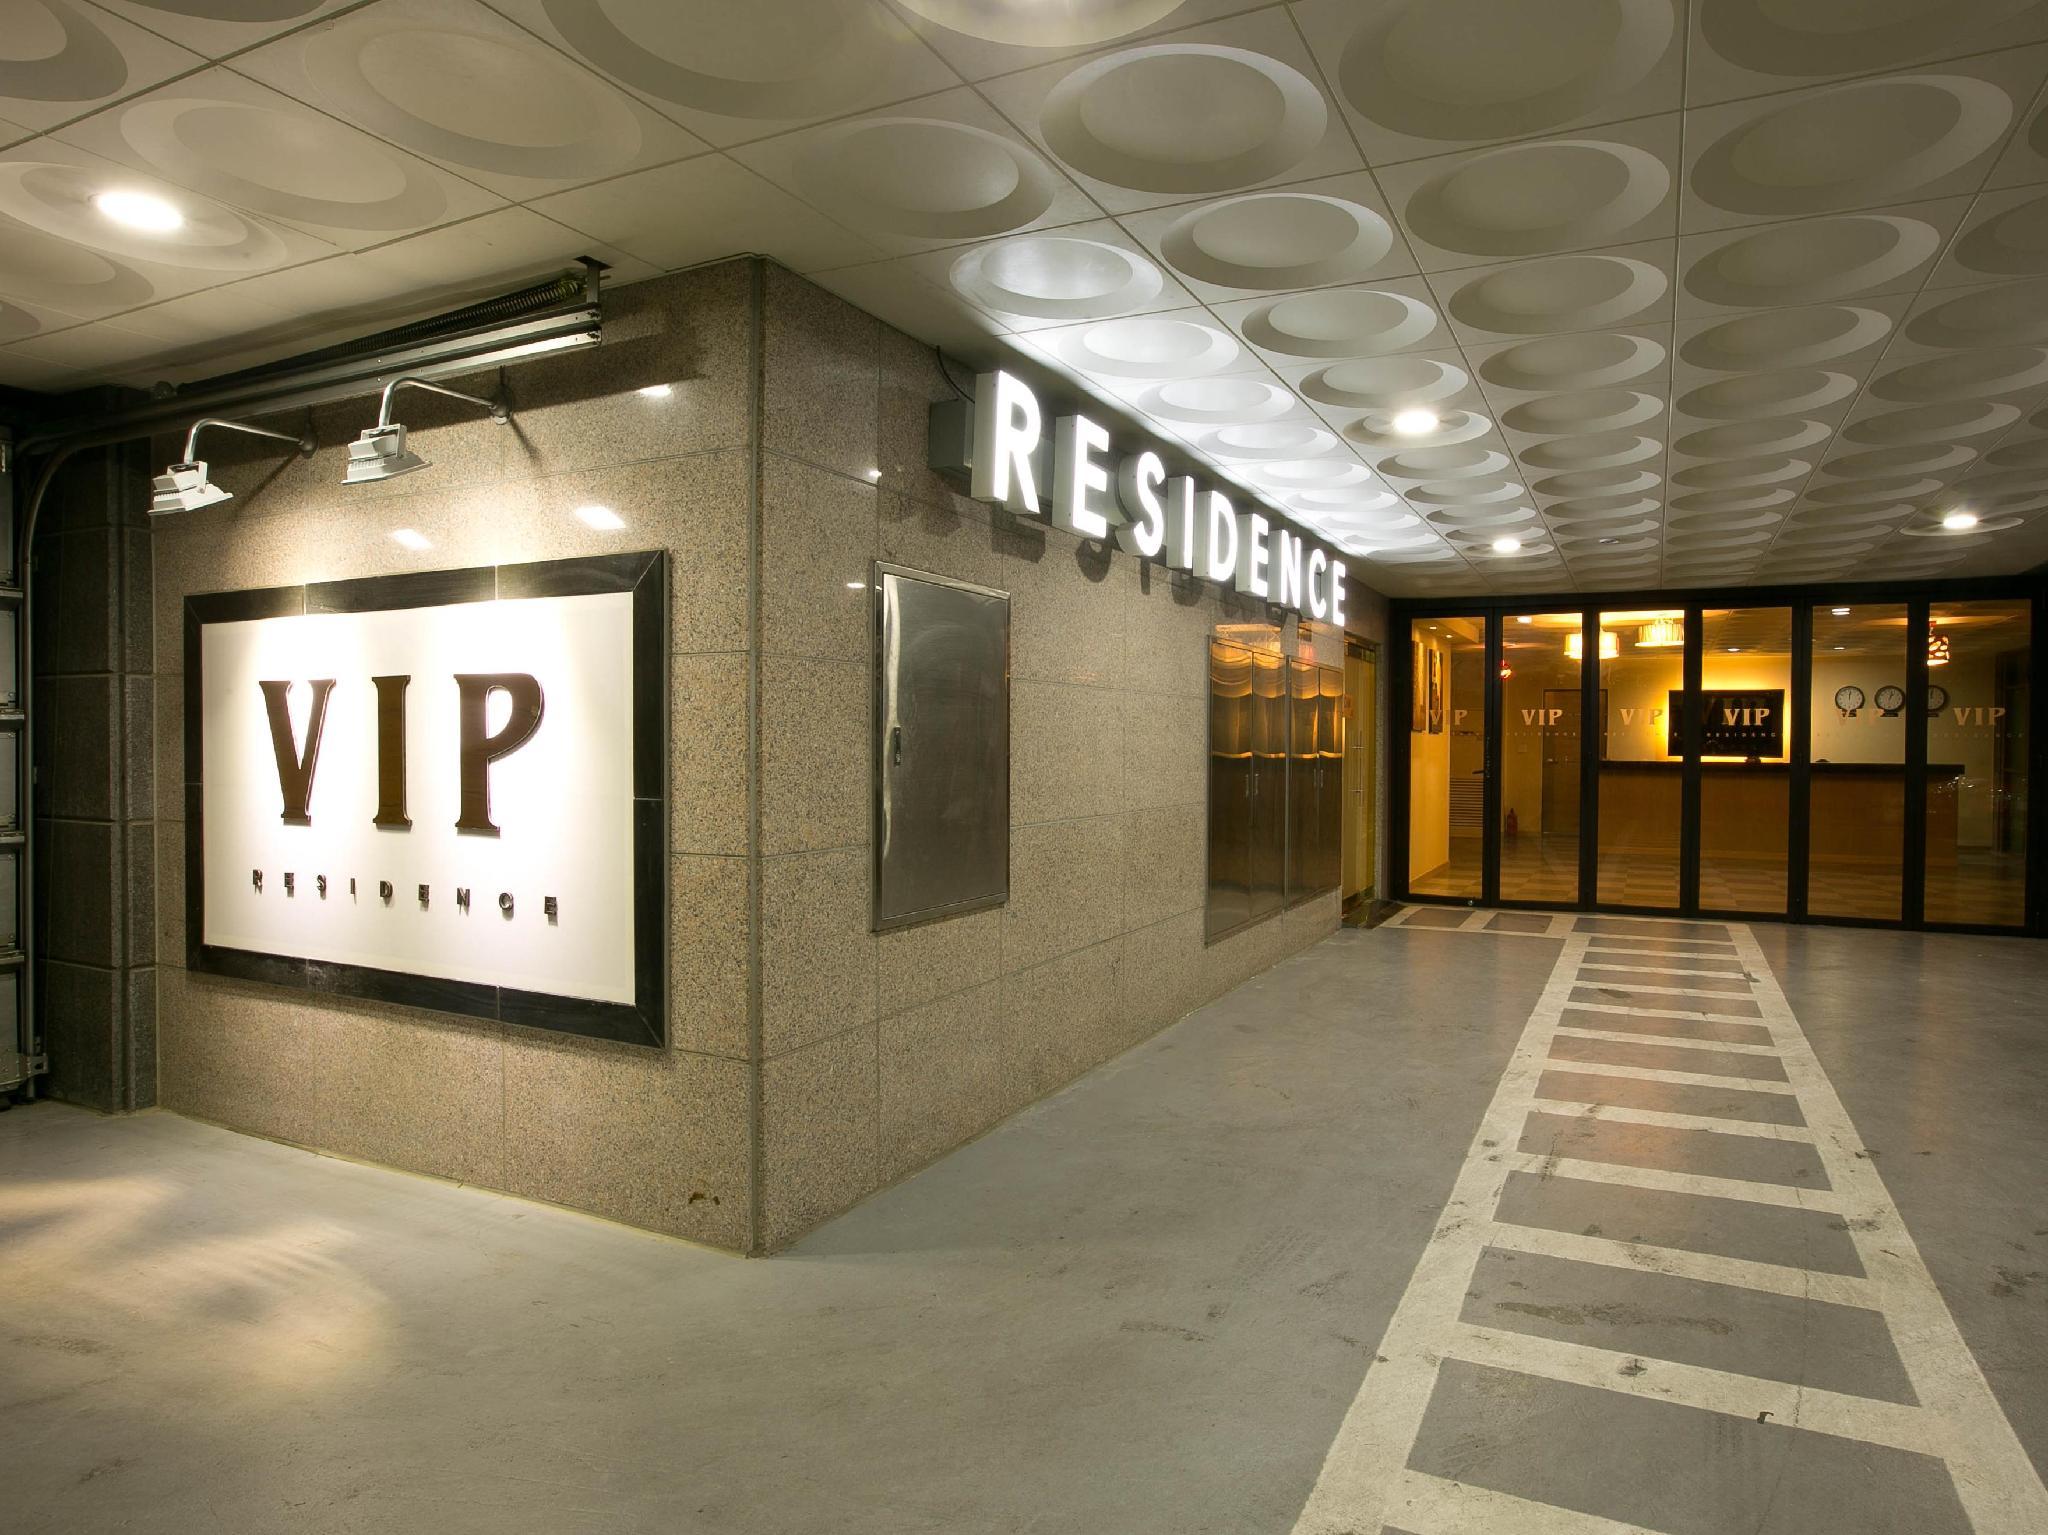 VIP Residence